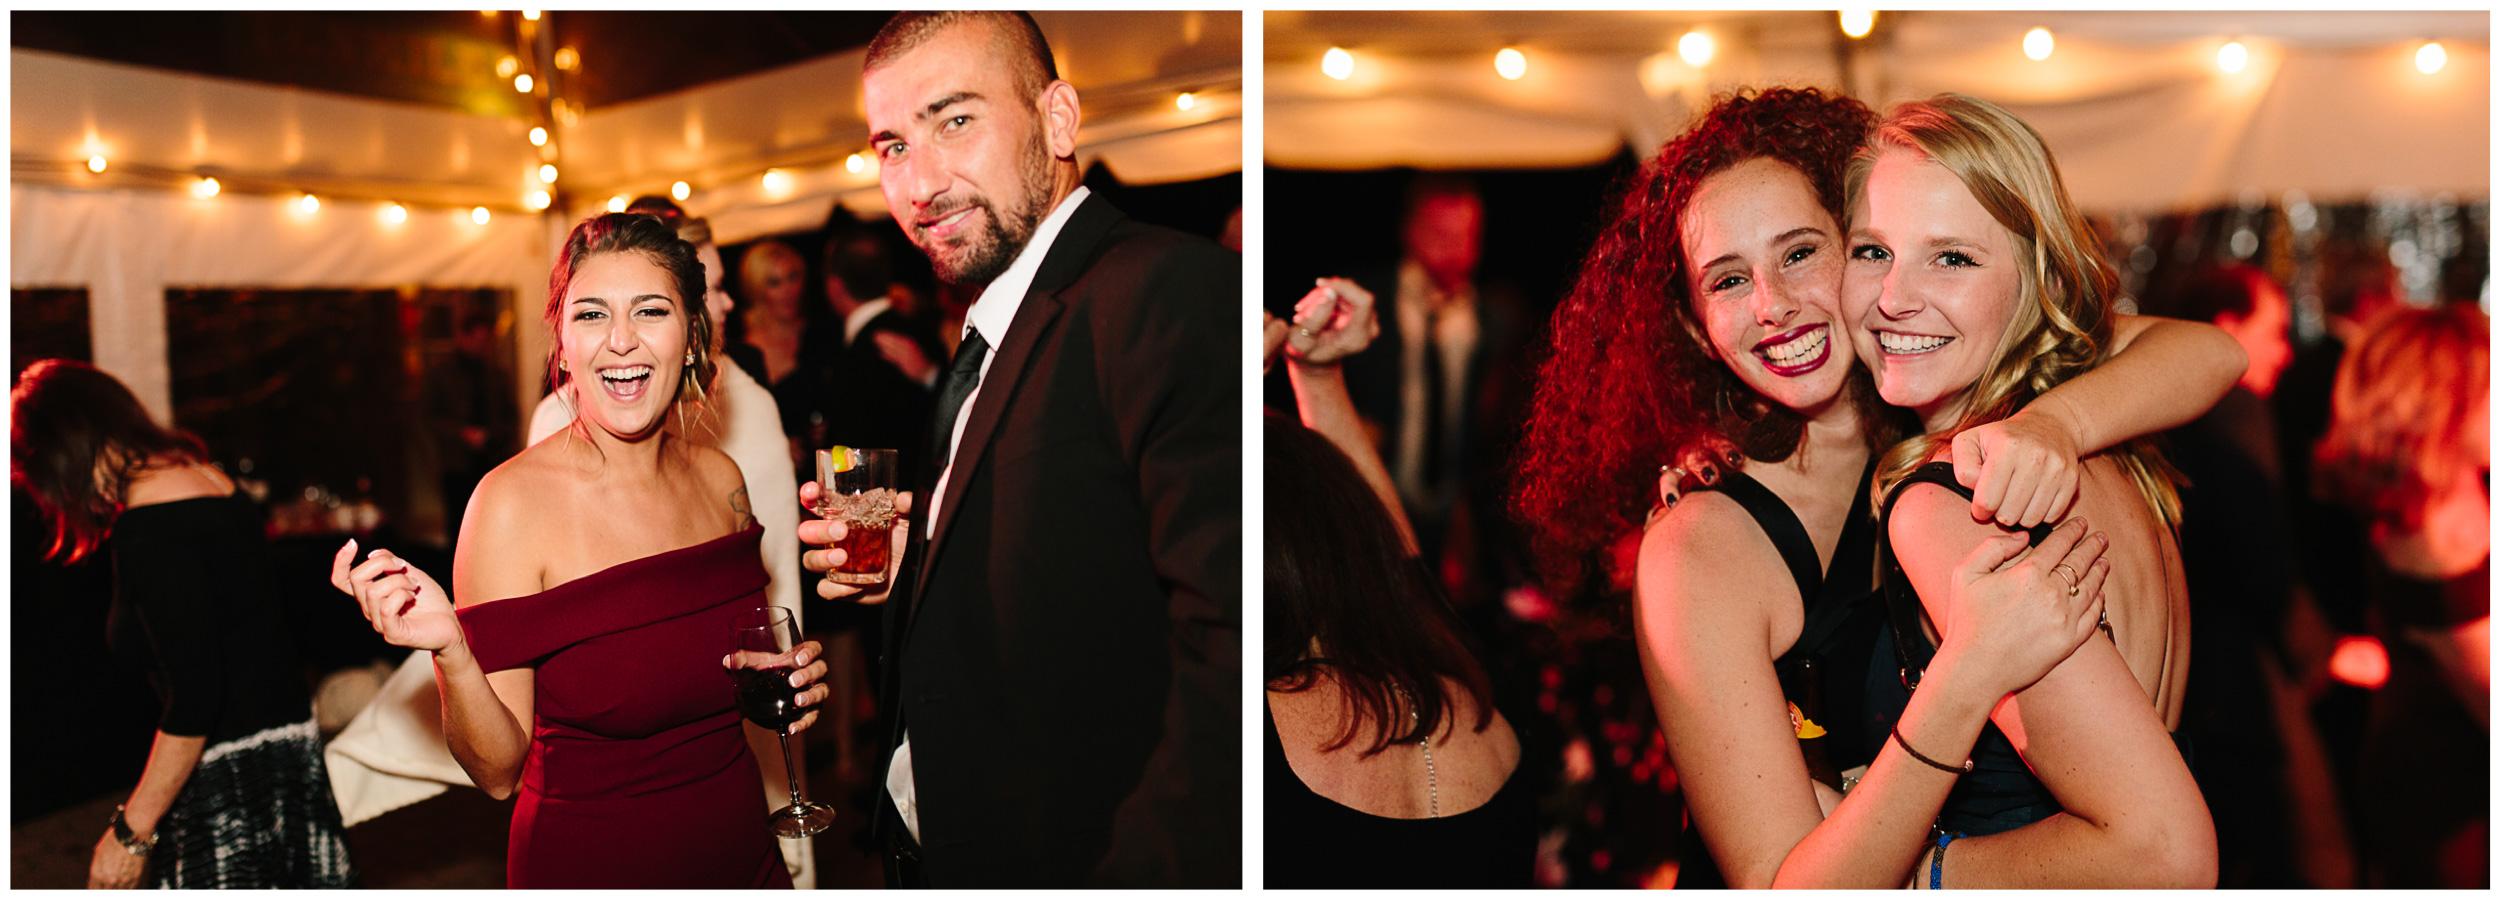 ten_mile_station_wedding_83.jpg